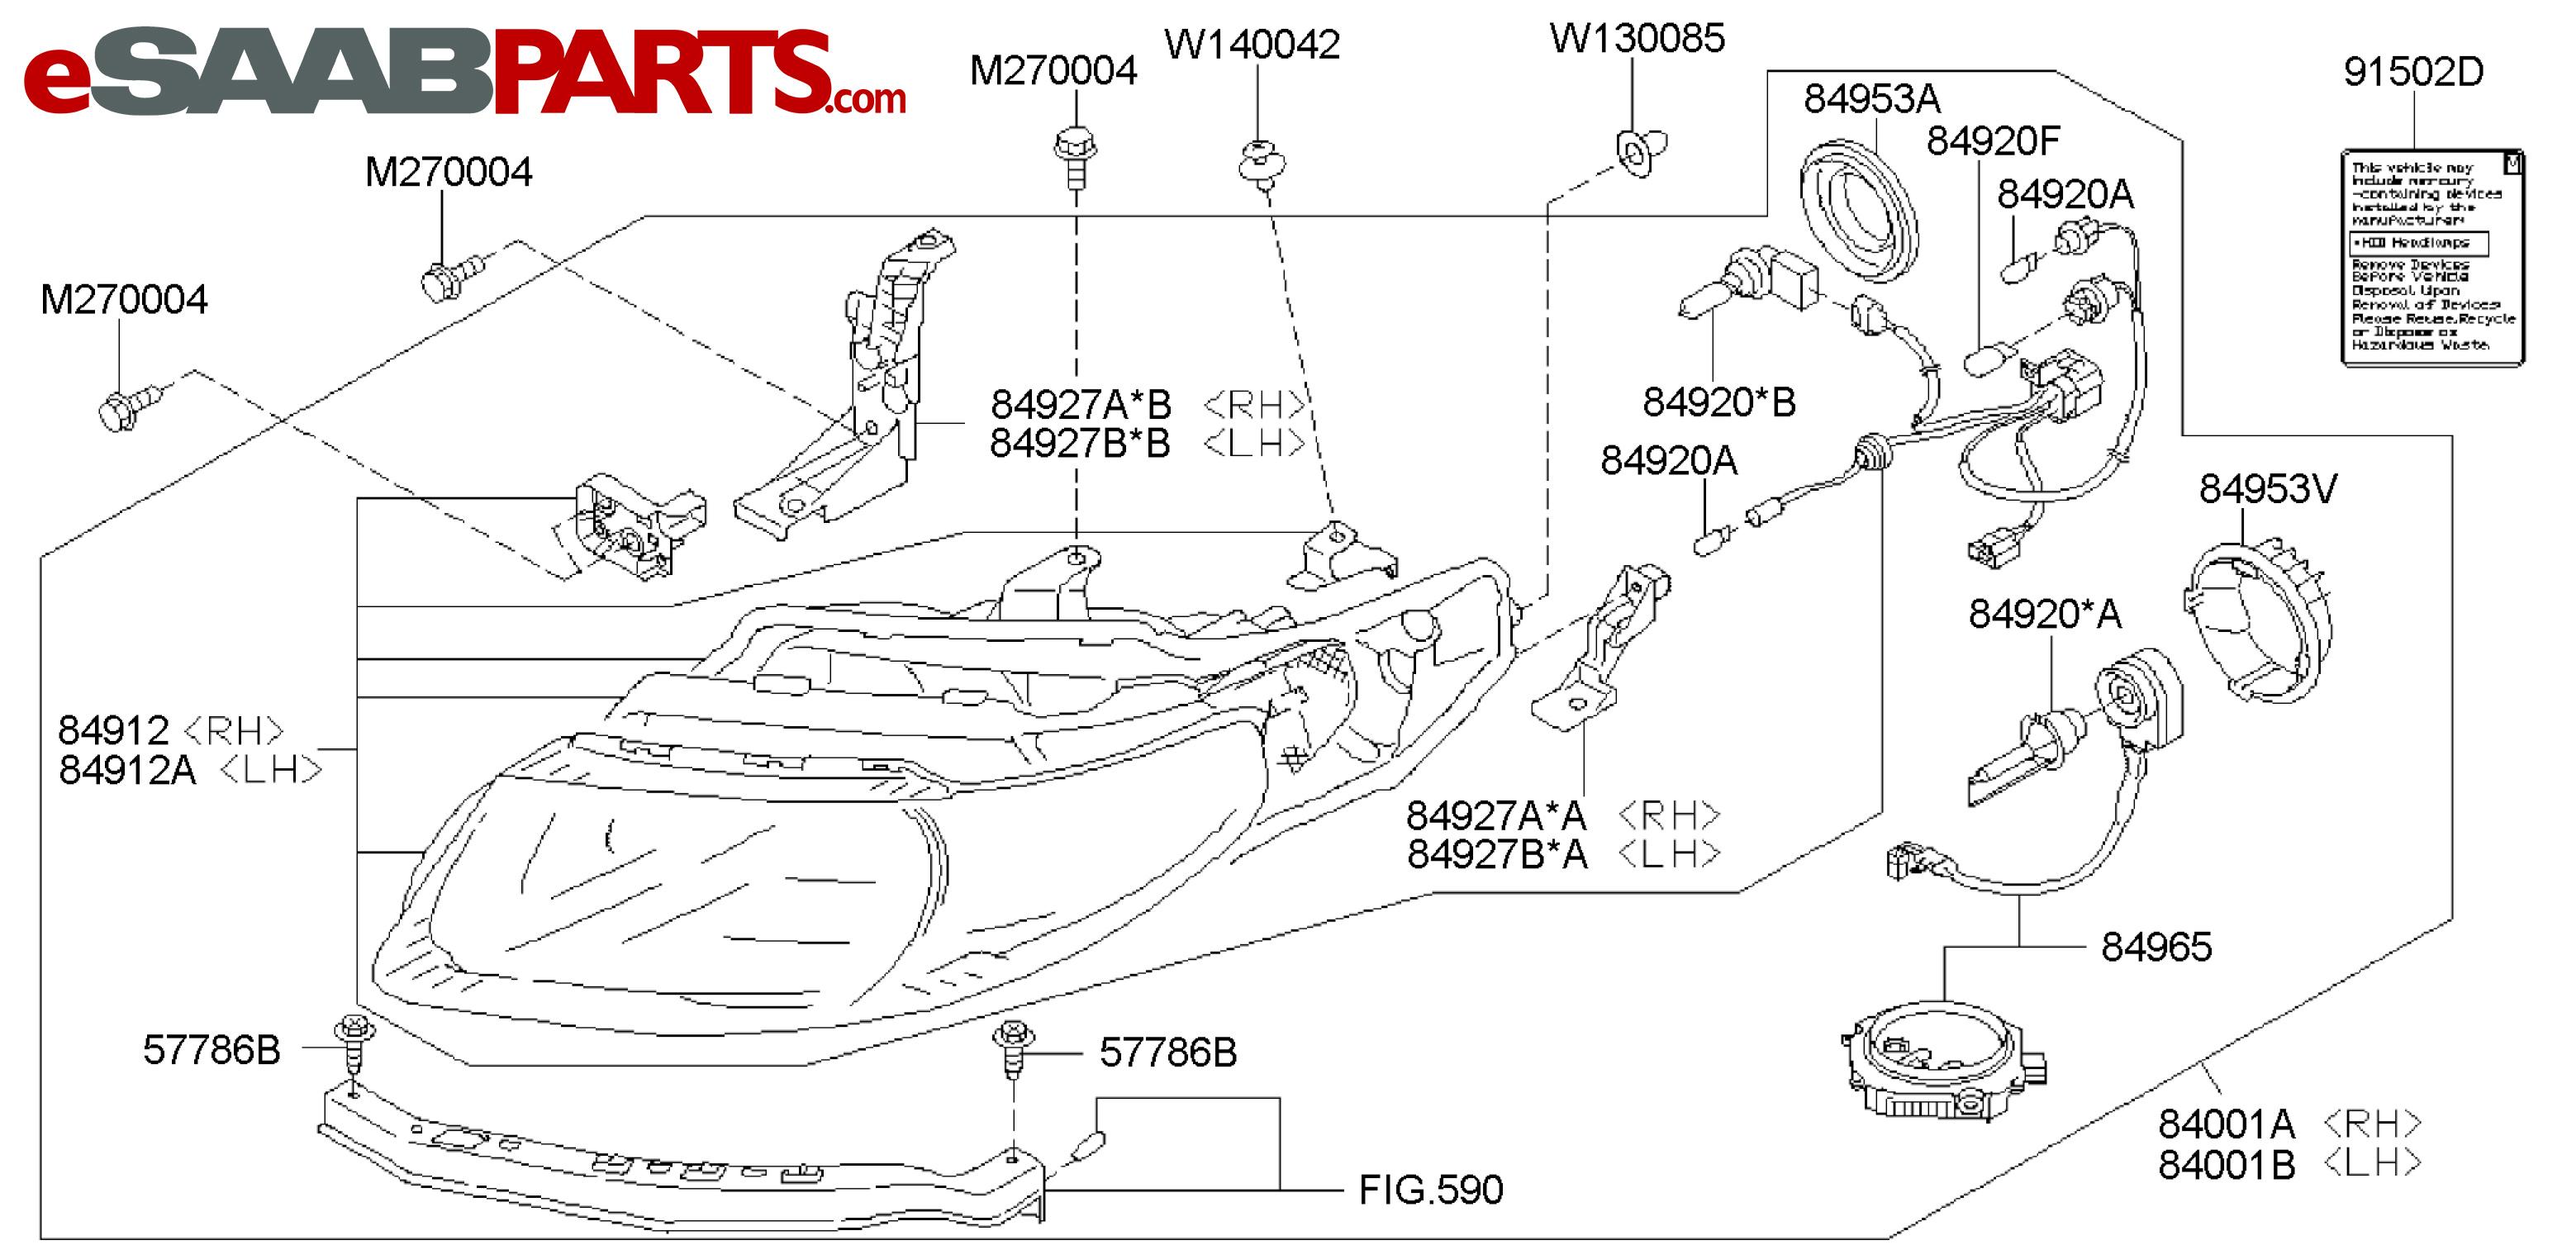 eSaabParts.com - Saab 9-2x > Electrical Parts > Lights & Related > HEAD  LAMP: HID